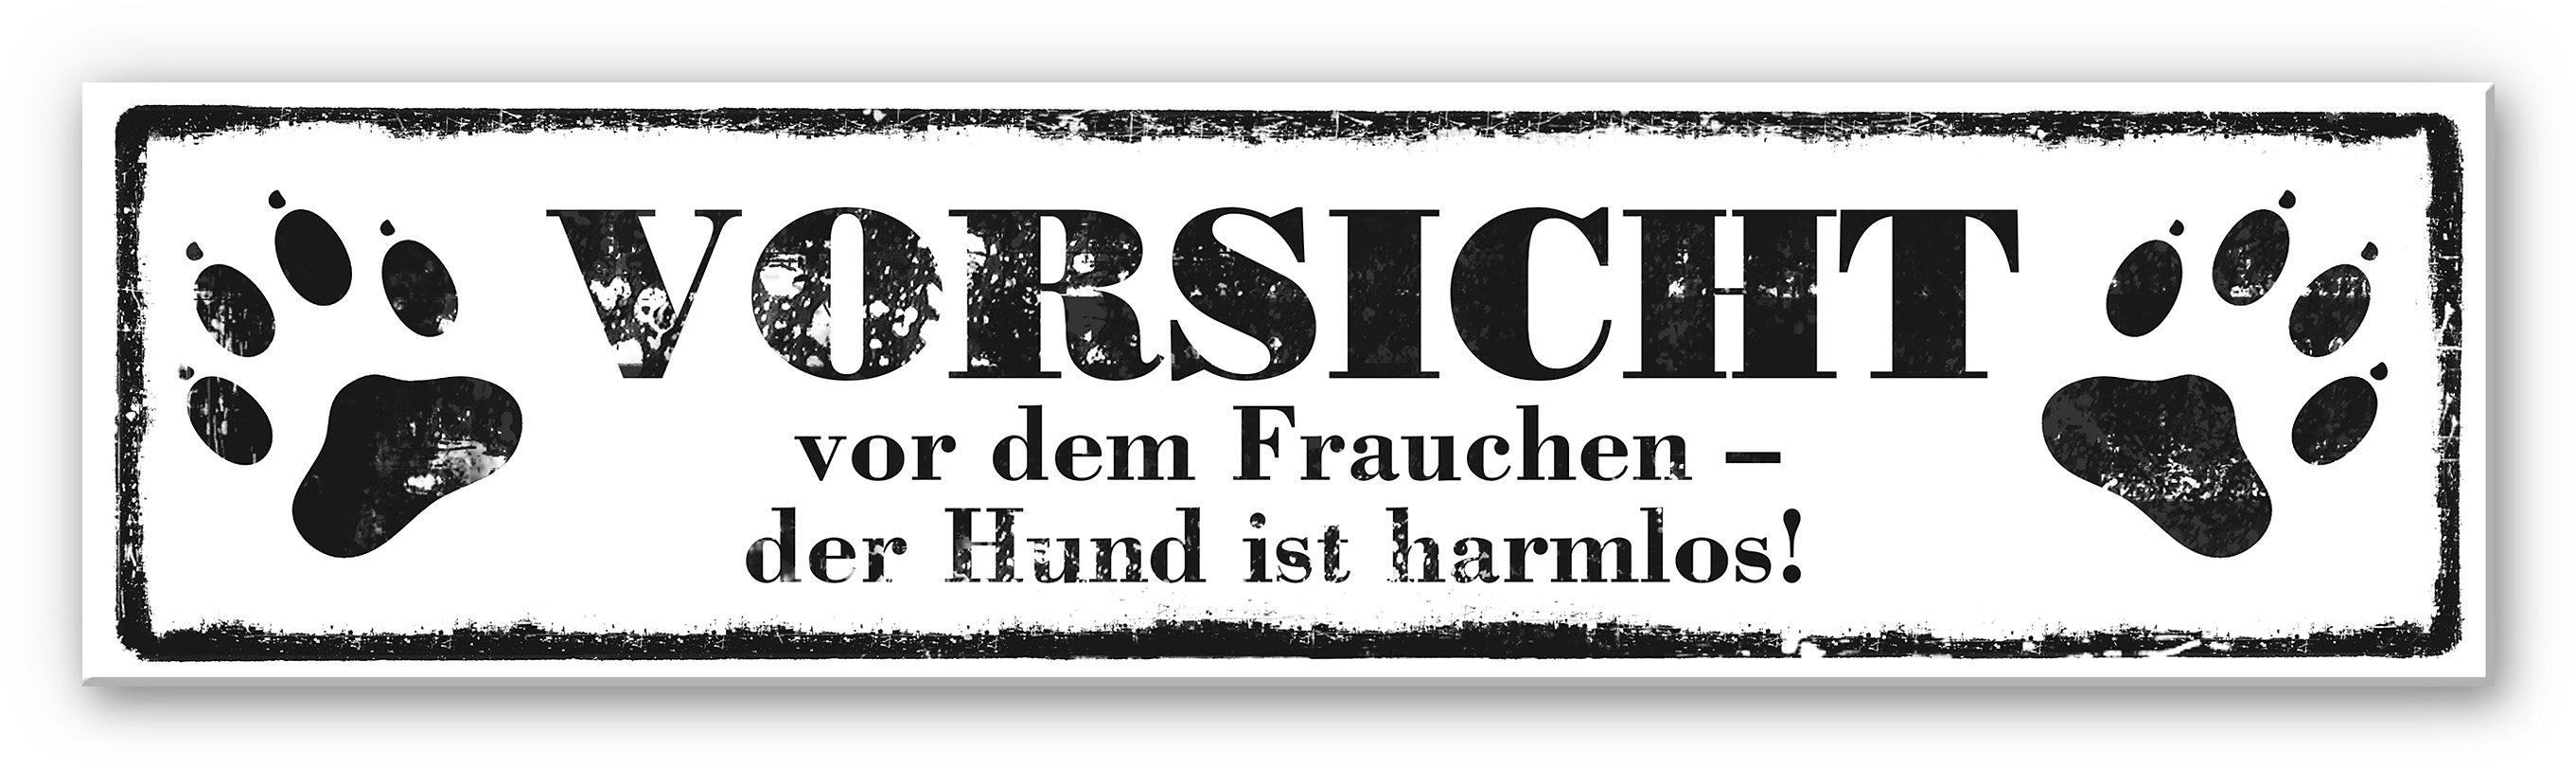 Home affaire Wandbild »Vorsicht vor dem Frauchen«, Vorsicht vor dem Frauchen